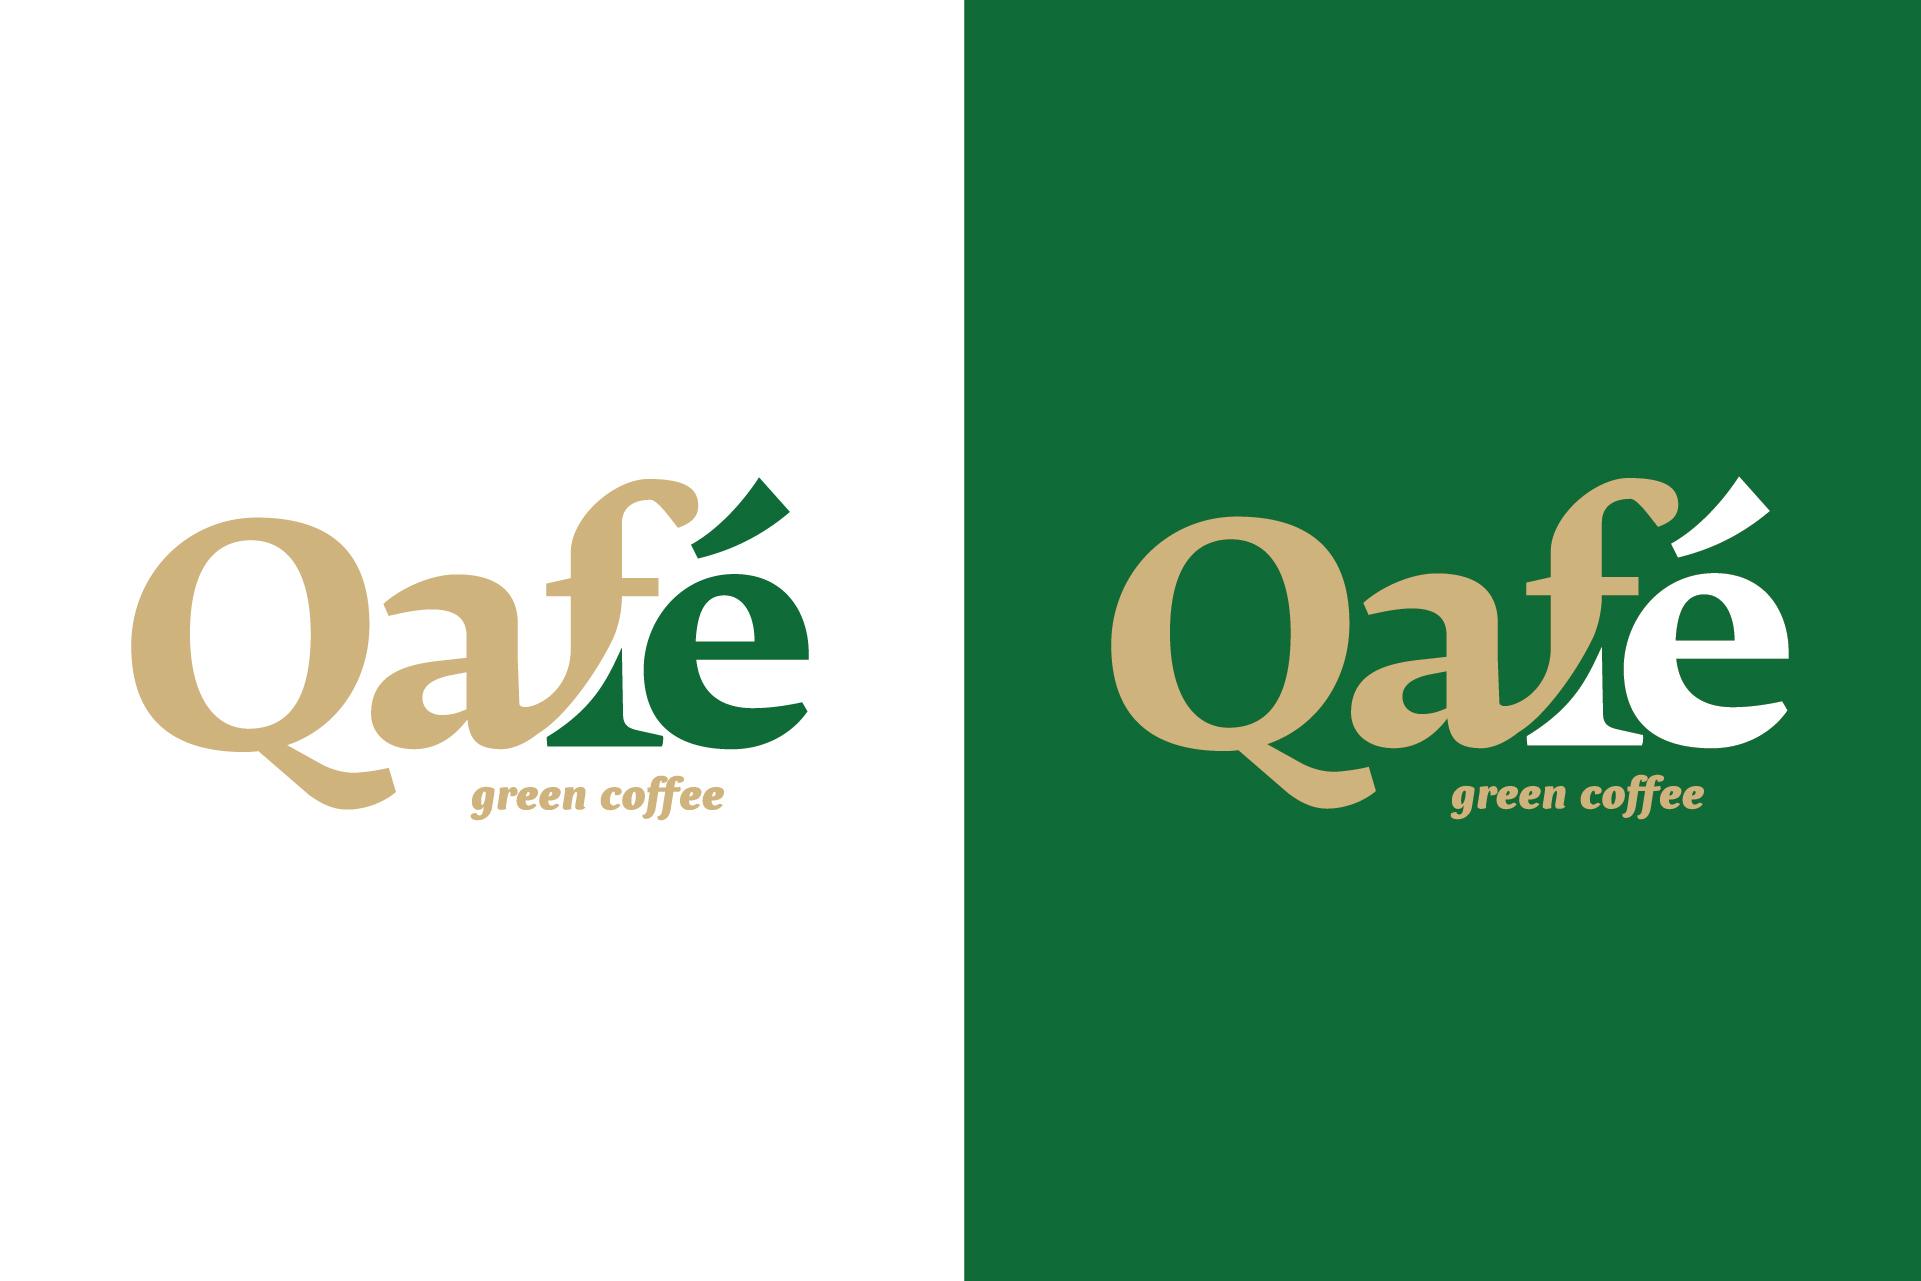 Qafe_logo_2-01